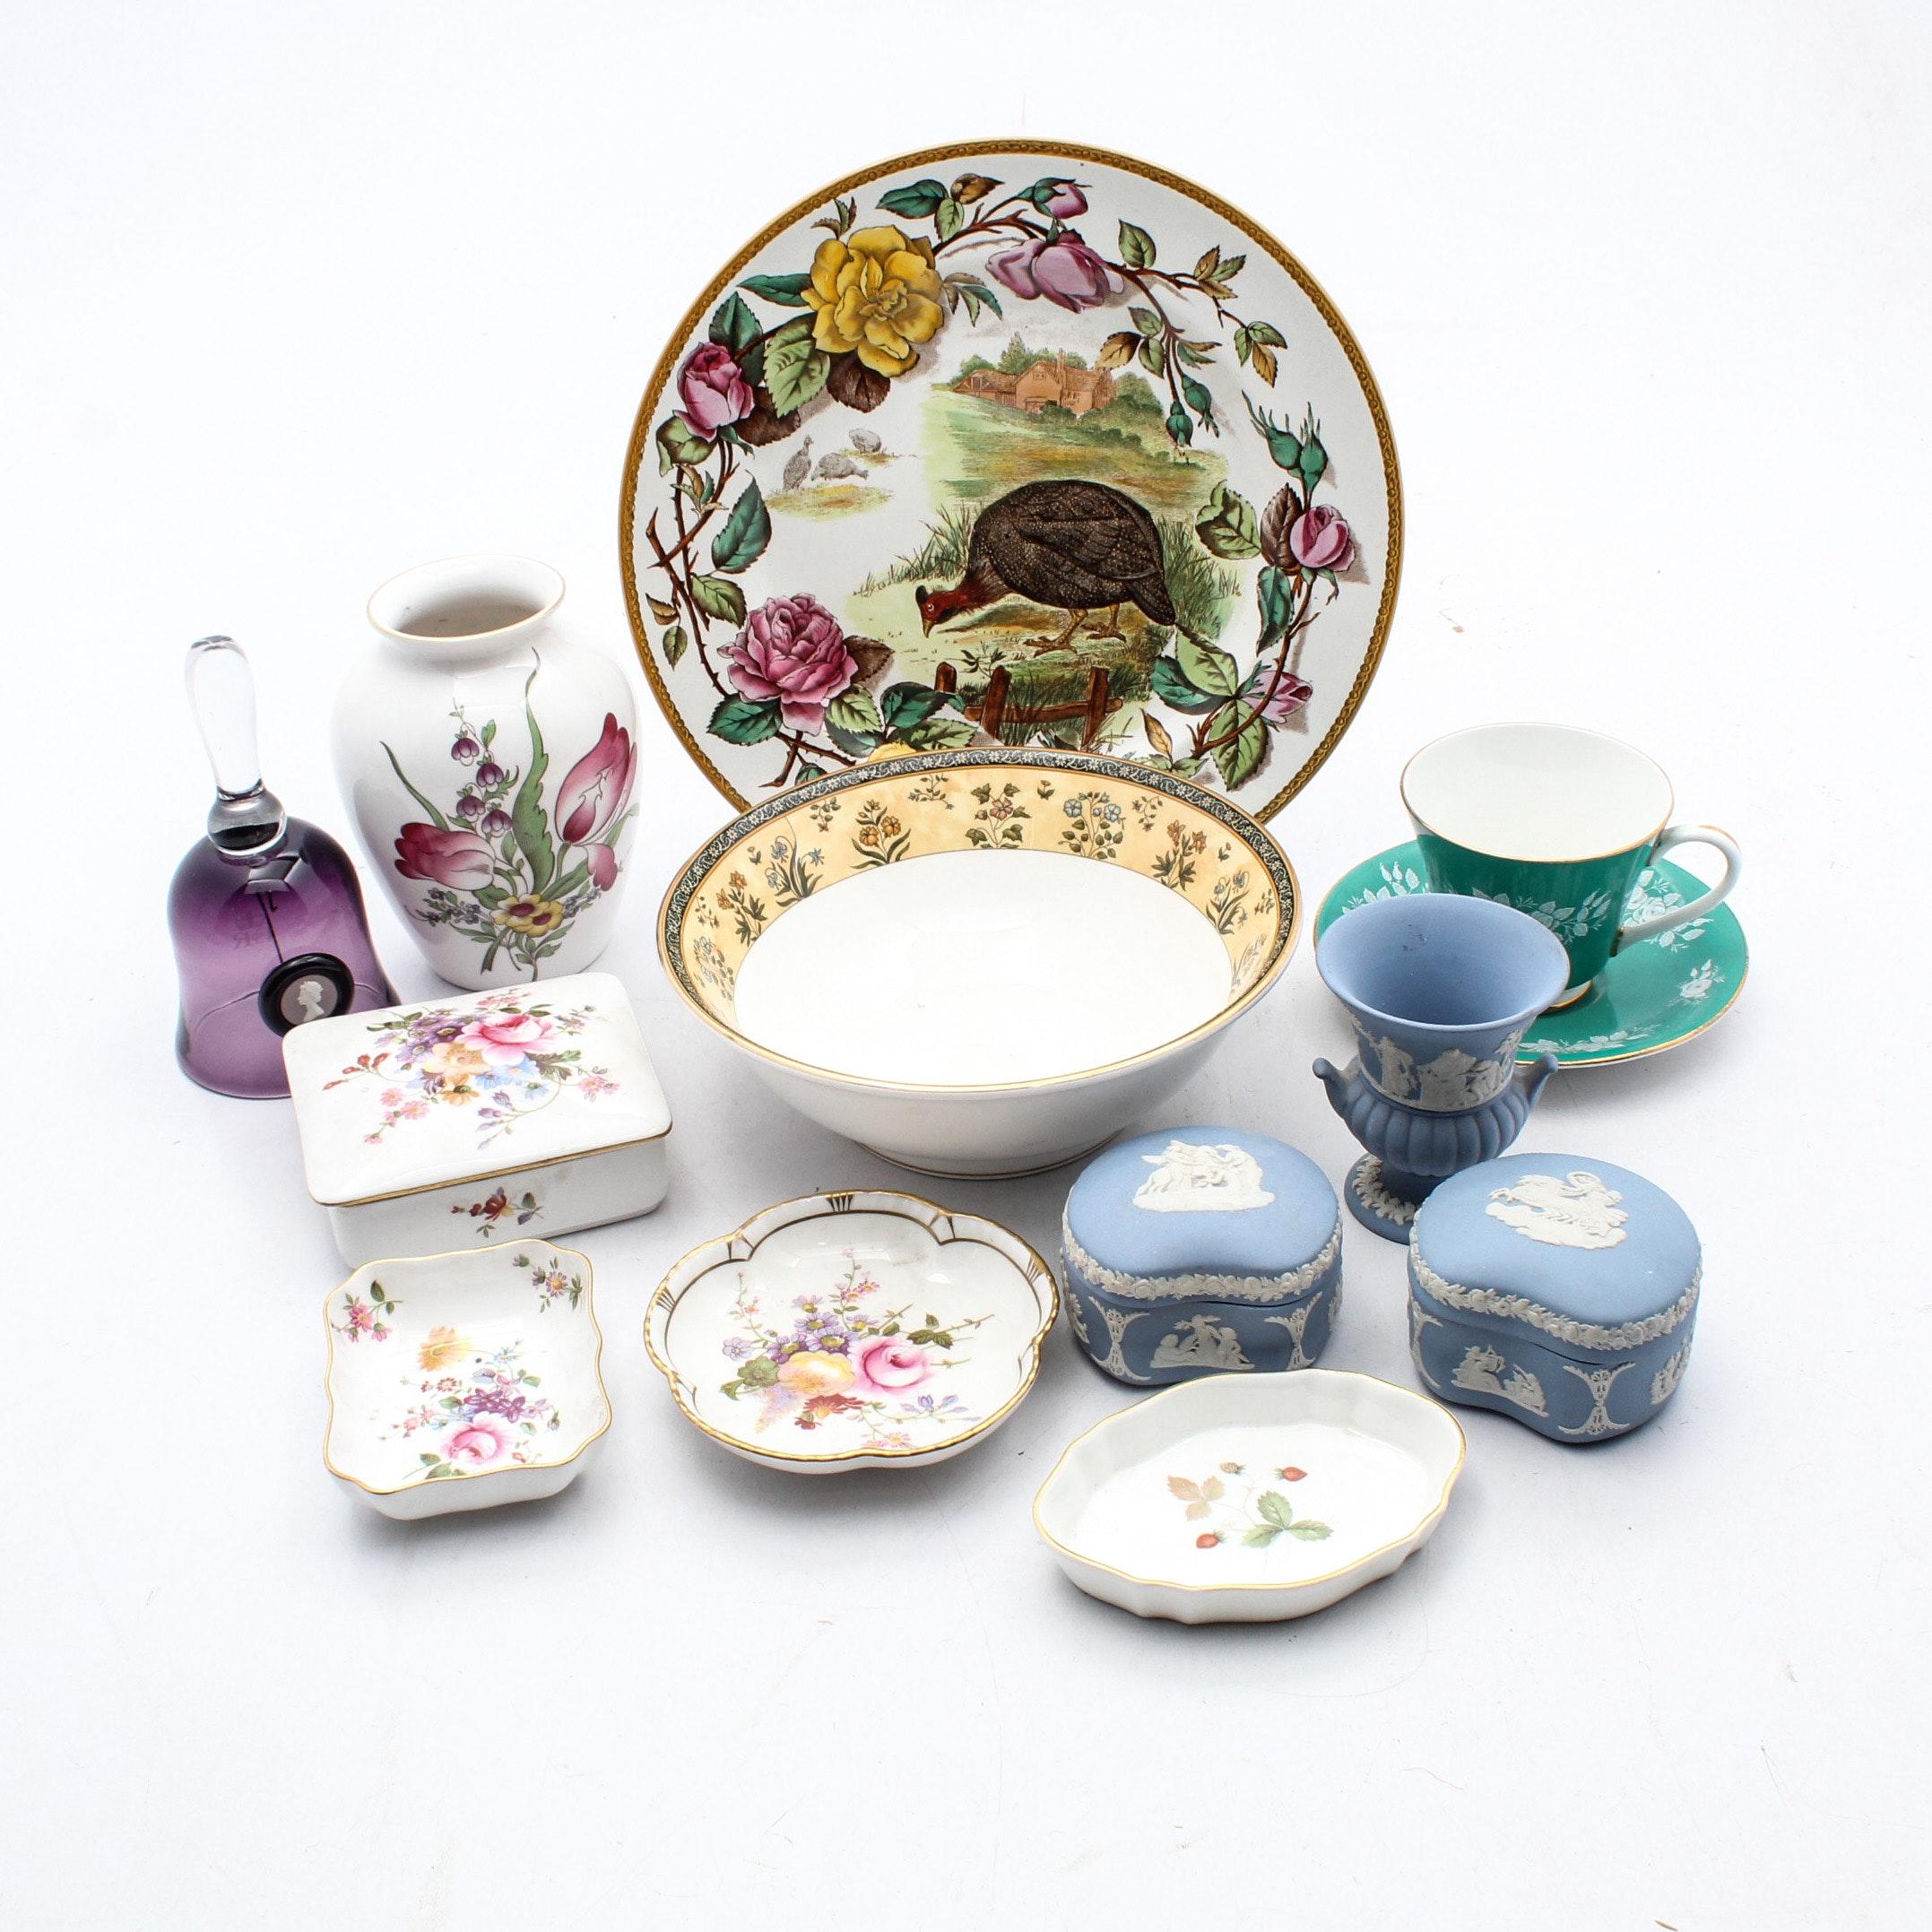 English Bone China and Jasperware Featuring Wedgwood, Royal Doulton and Spode